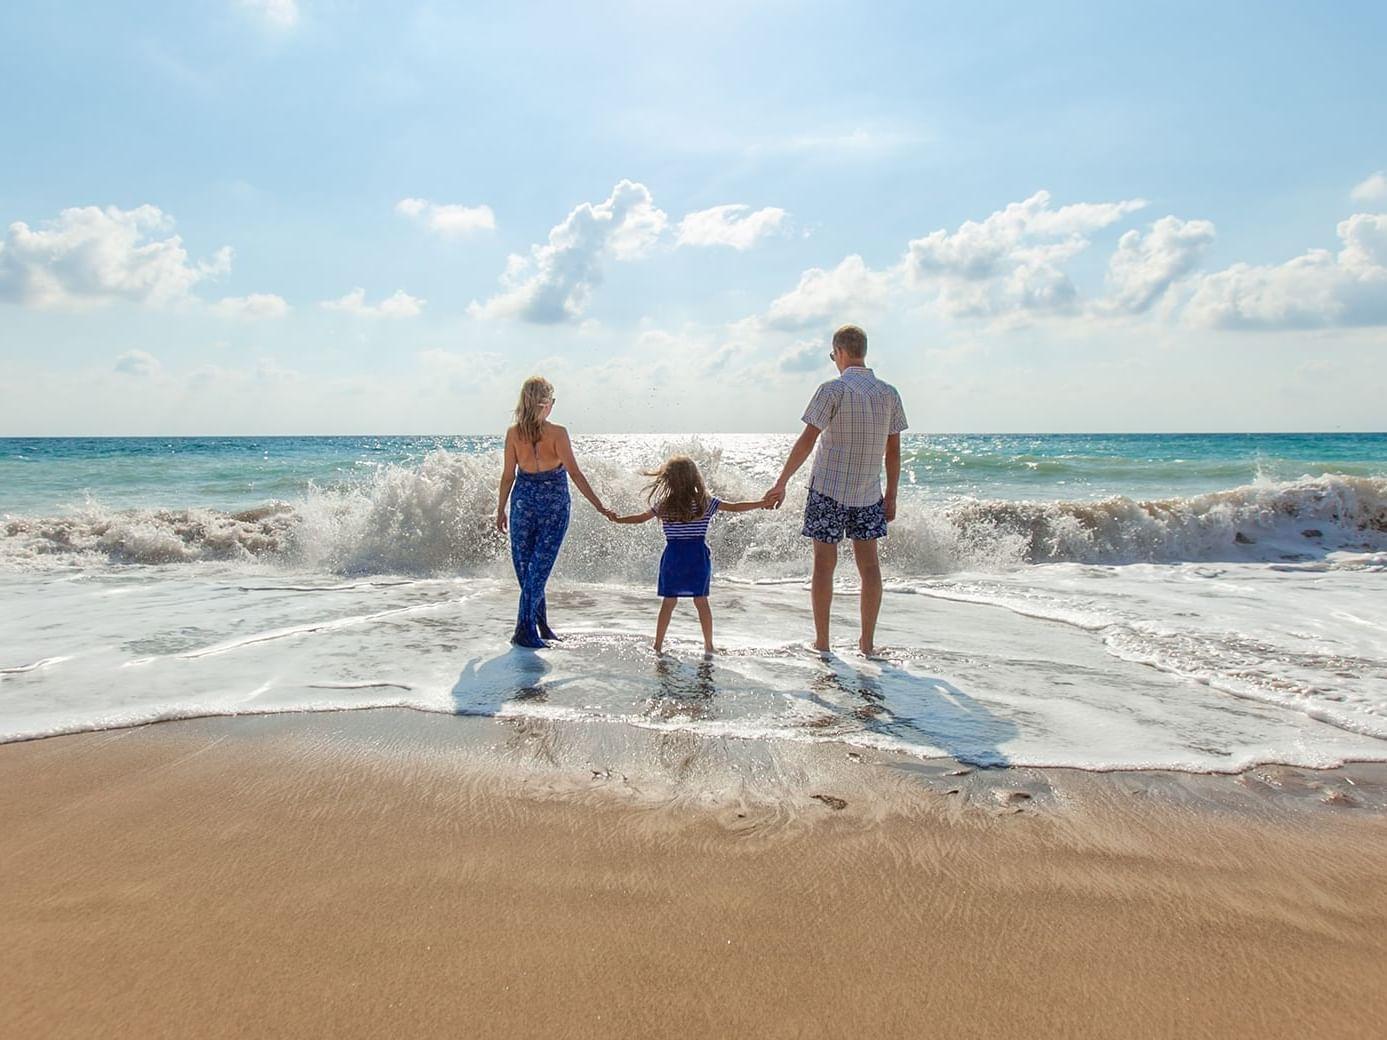 Beach view - Legacy Vacation Resorts